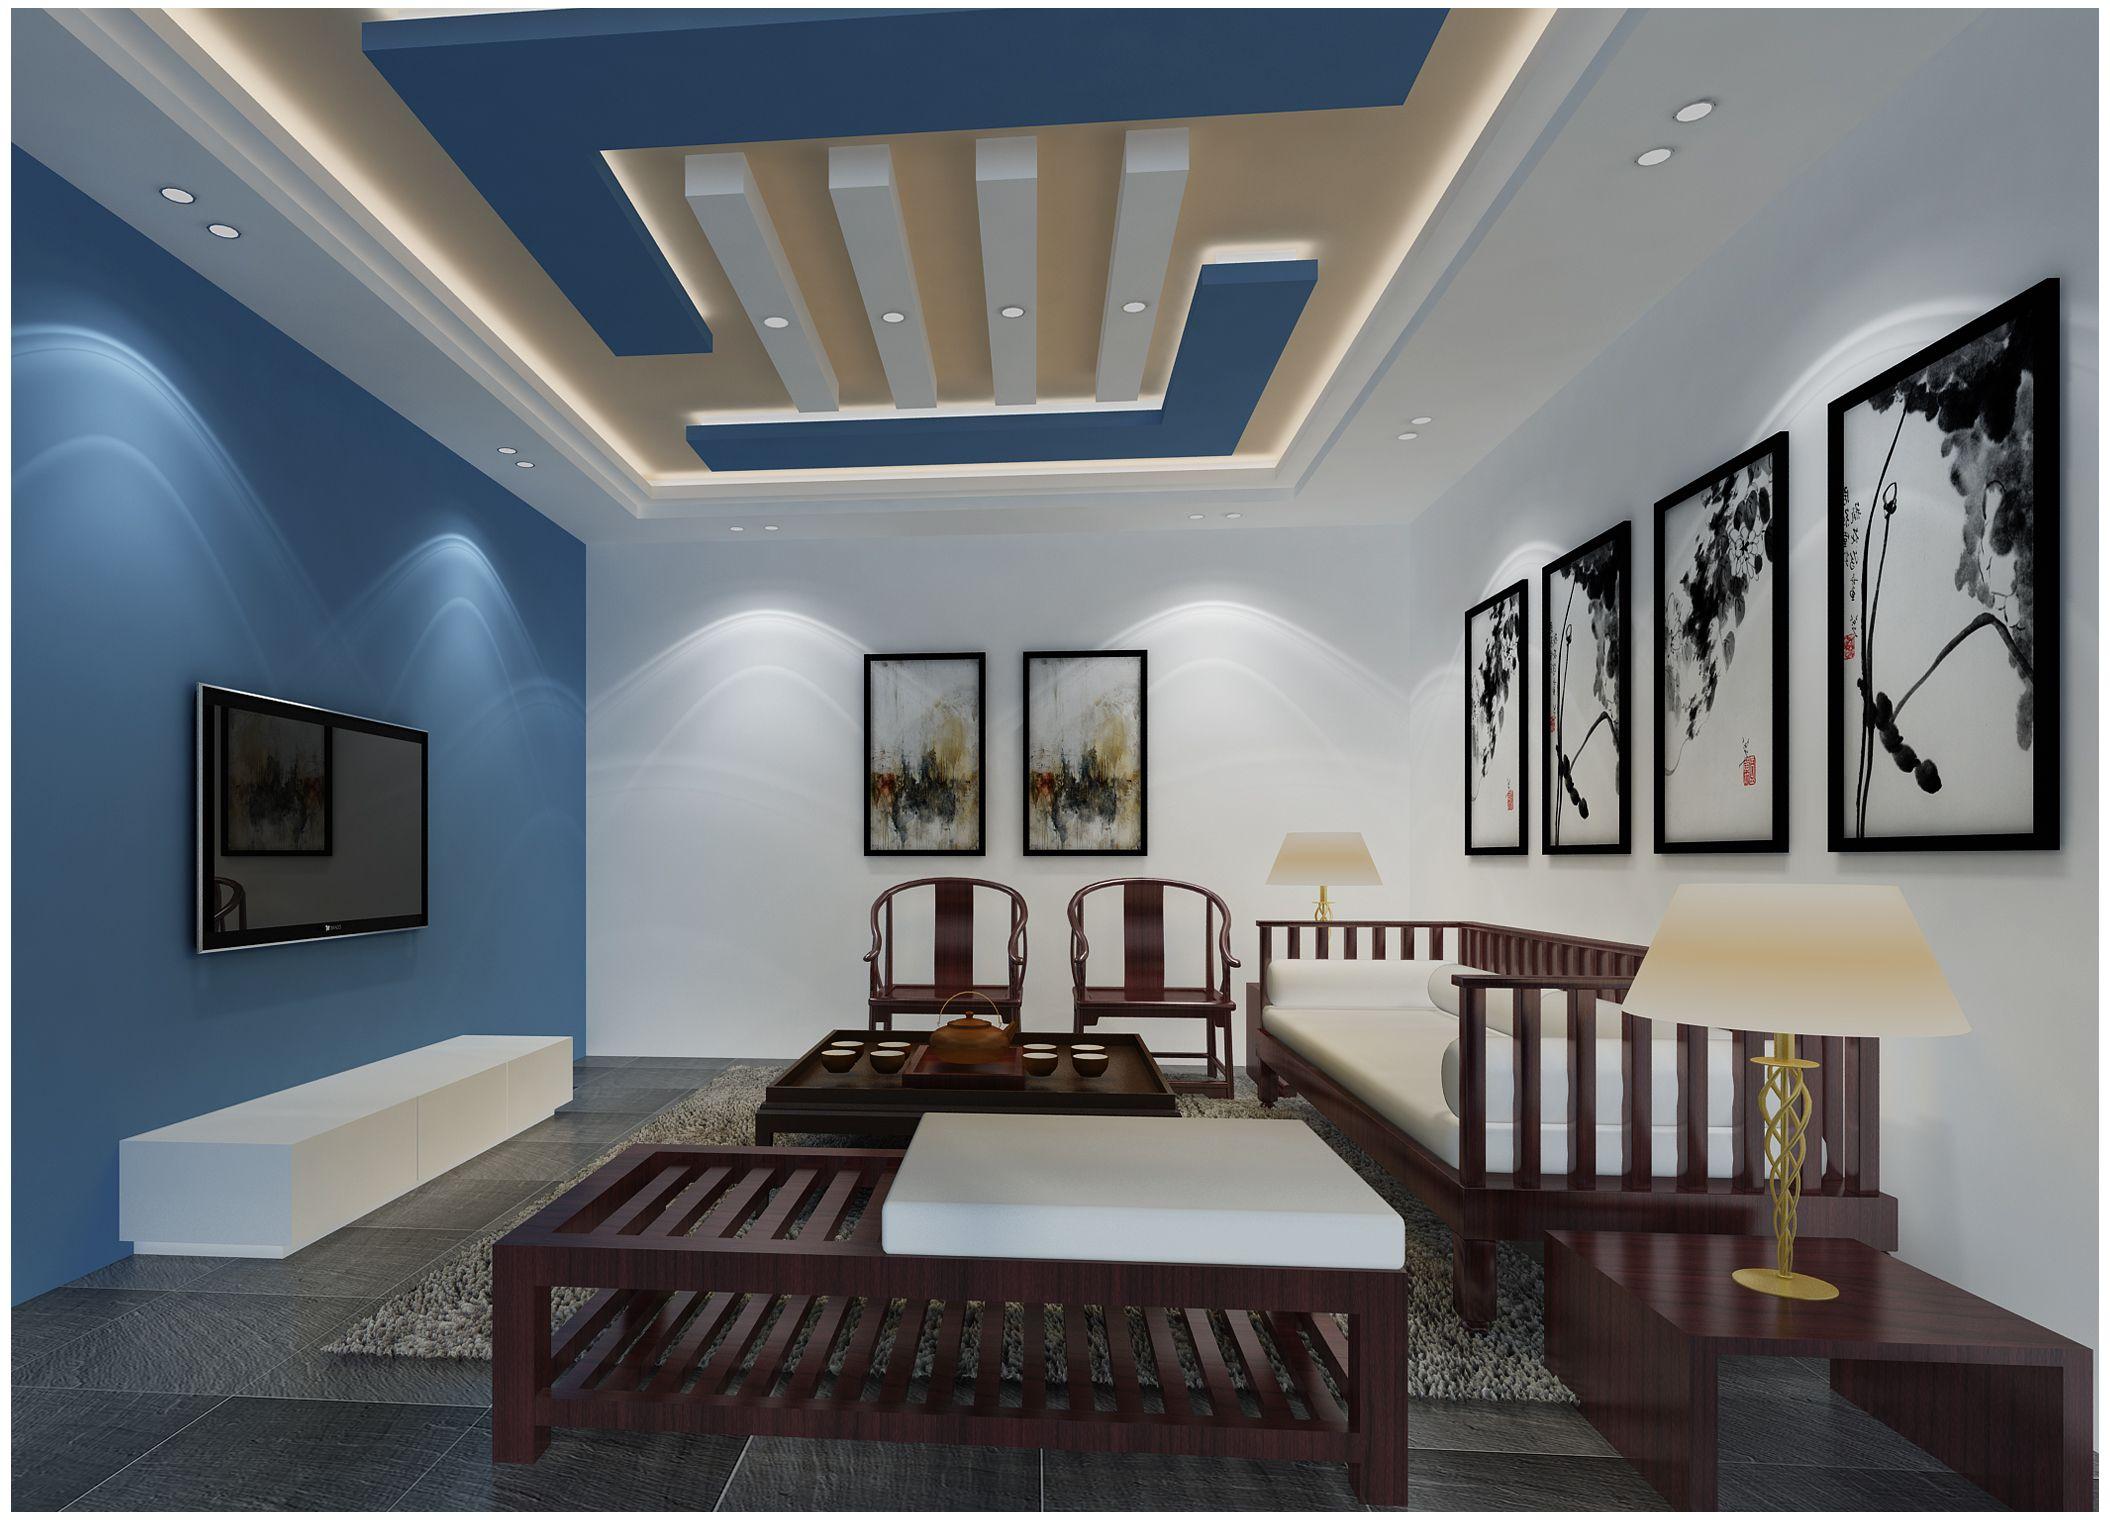 Latest False Ceiling Designs For Living Room 2021 Pop Design For Hall Gypsum Board Ceiling Ideas Dubai Khalifa